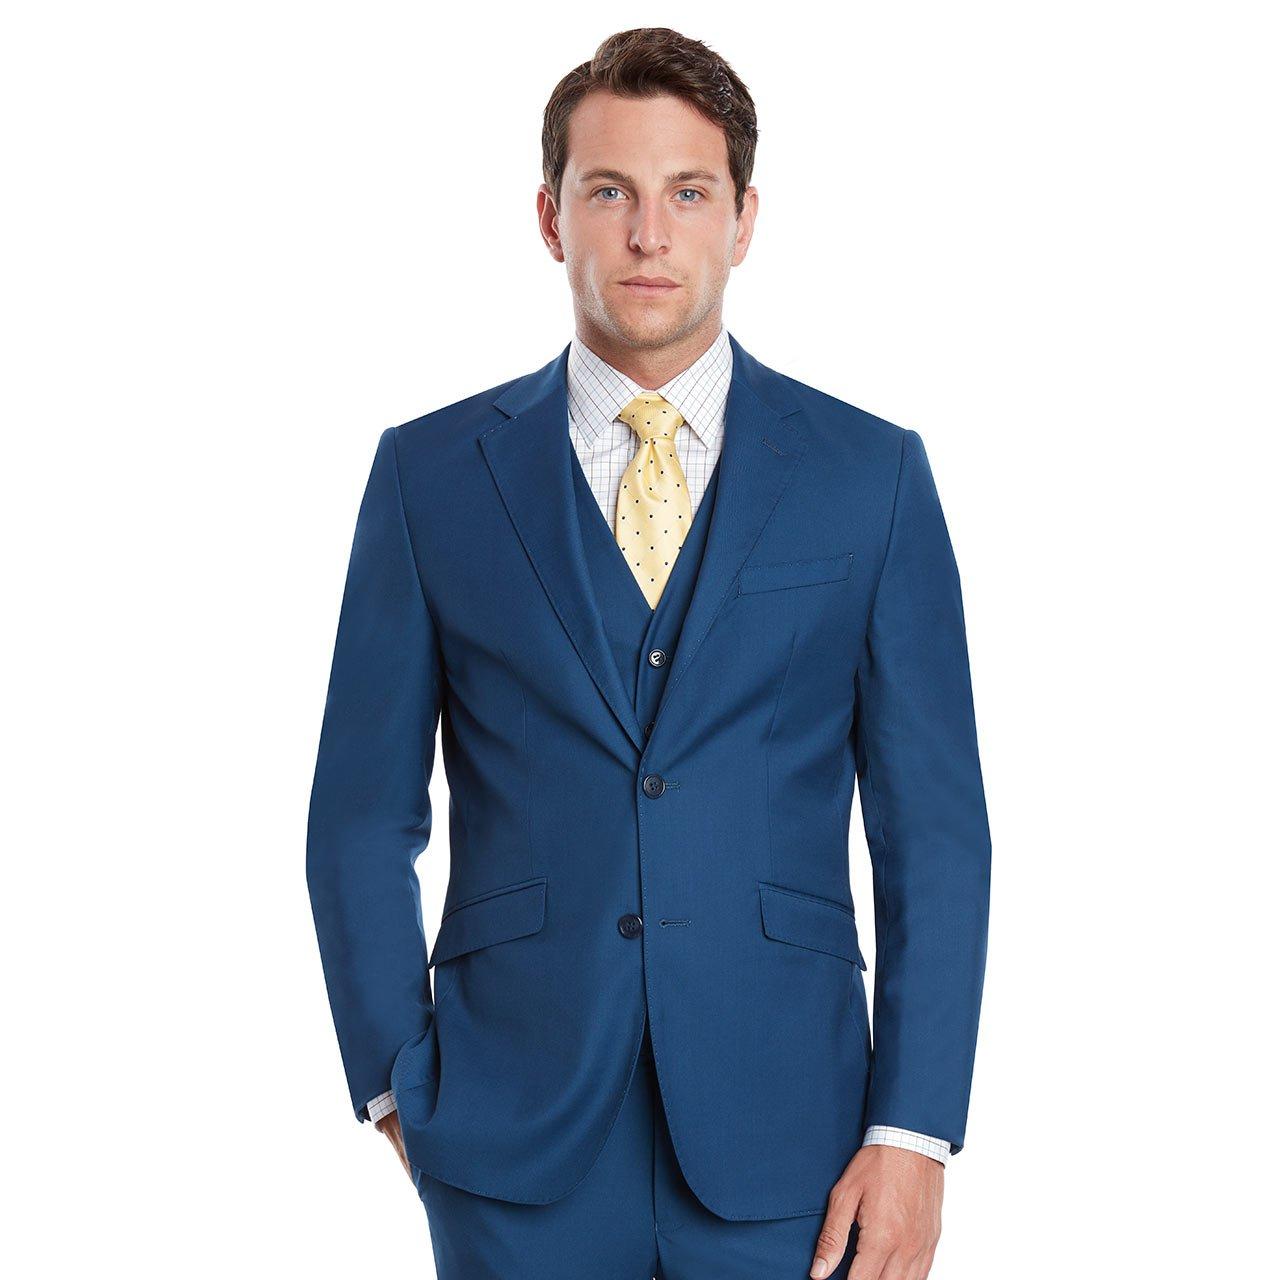 Mens Slim Fit Notched Lapel 3 Piece Suit Set Designed by Taheri French Blue 80/20(US 36R / EU 46R / Waist 30) by Sebastian Taheri Uomo (Image #2)